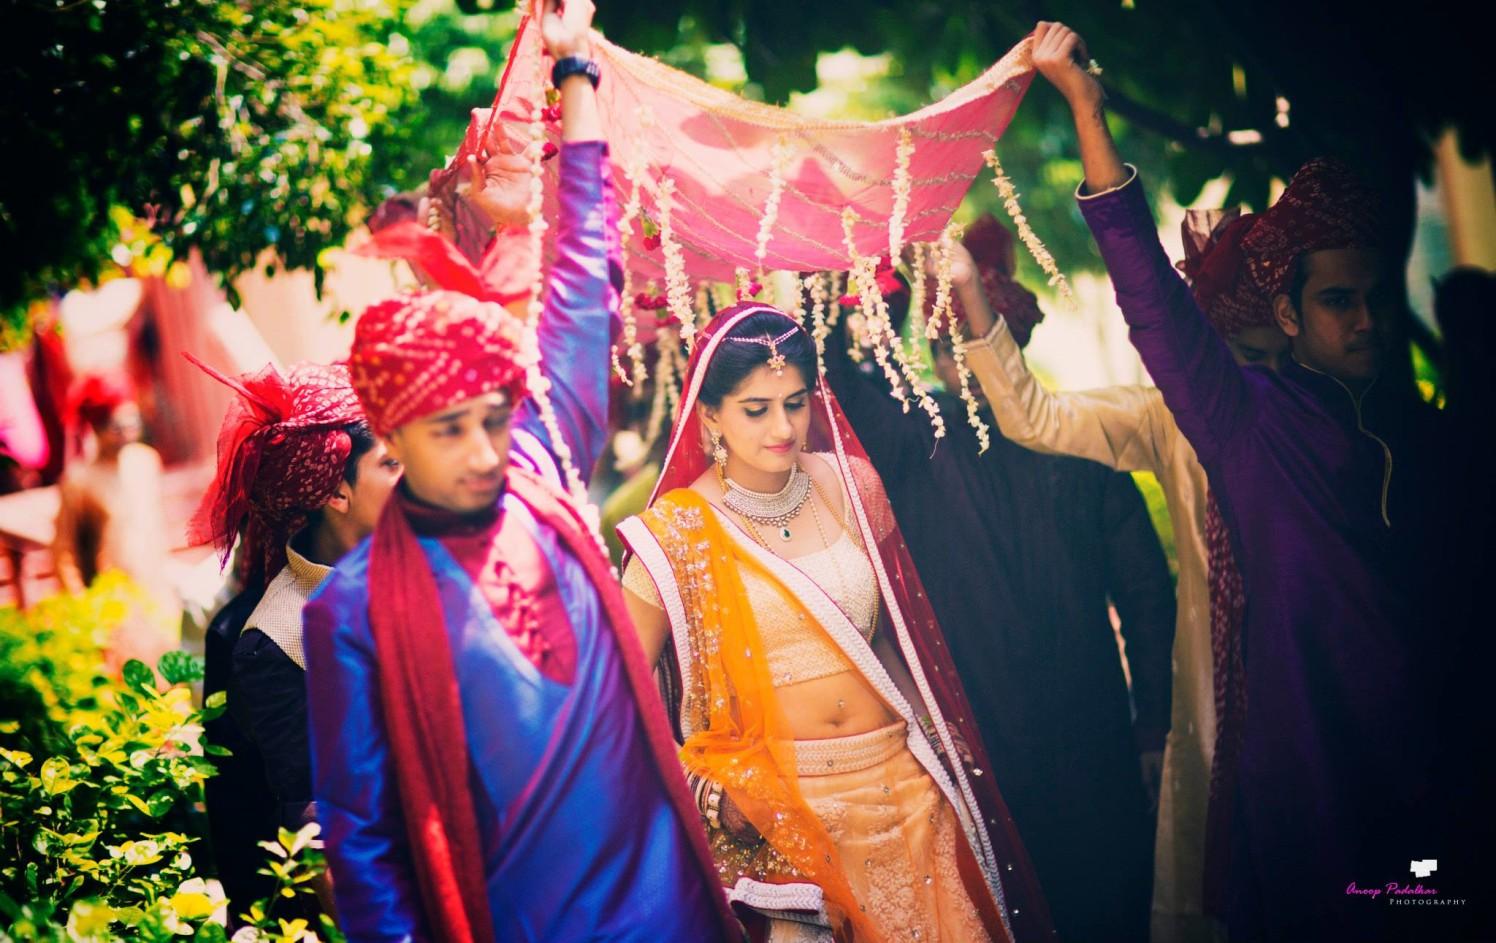 Grand entry by Wedding Krafter